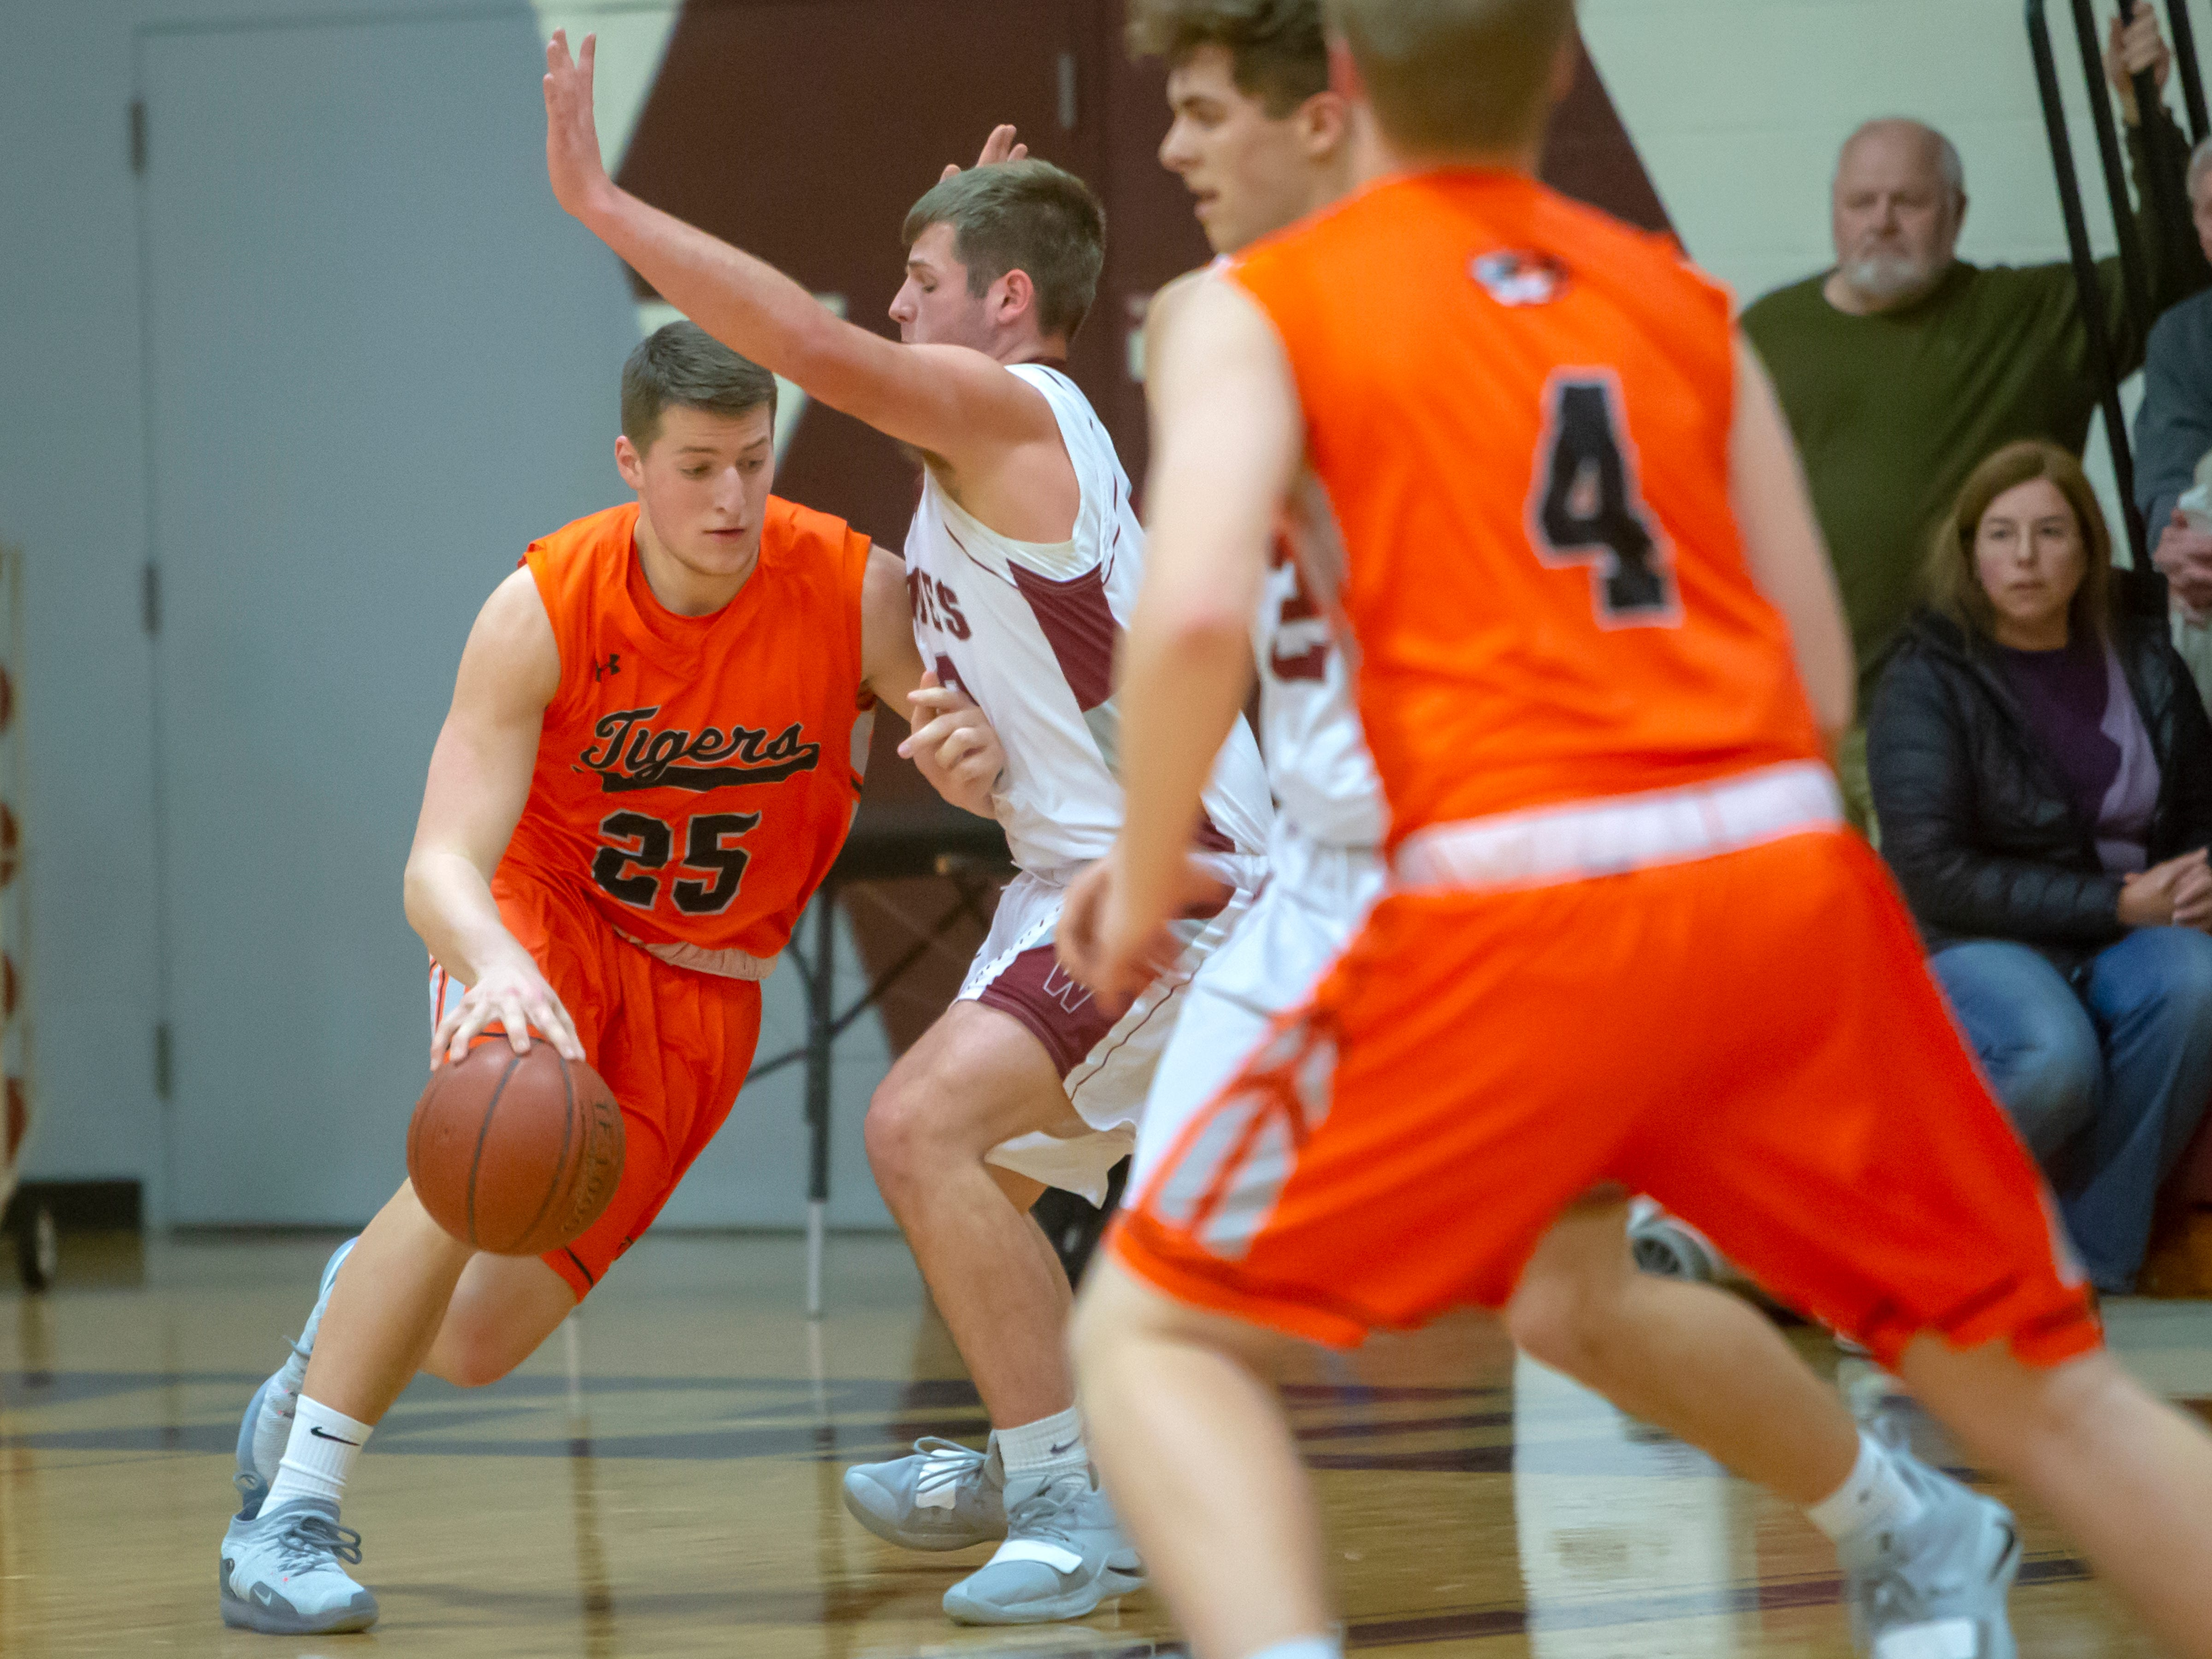 Ripon's Hunter Schneider drives the ball around Winneconne's Andrew Jensen at Winneconne High School on Thursday, January 24, 2019.